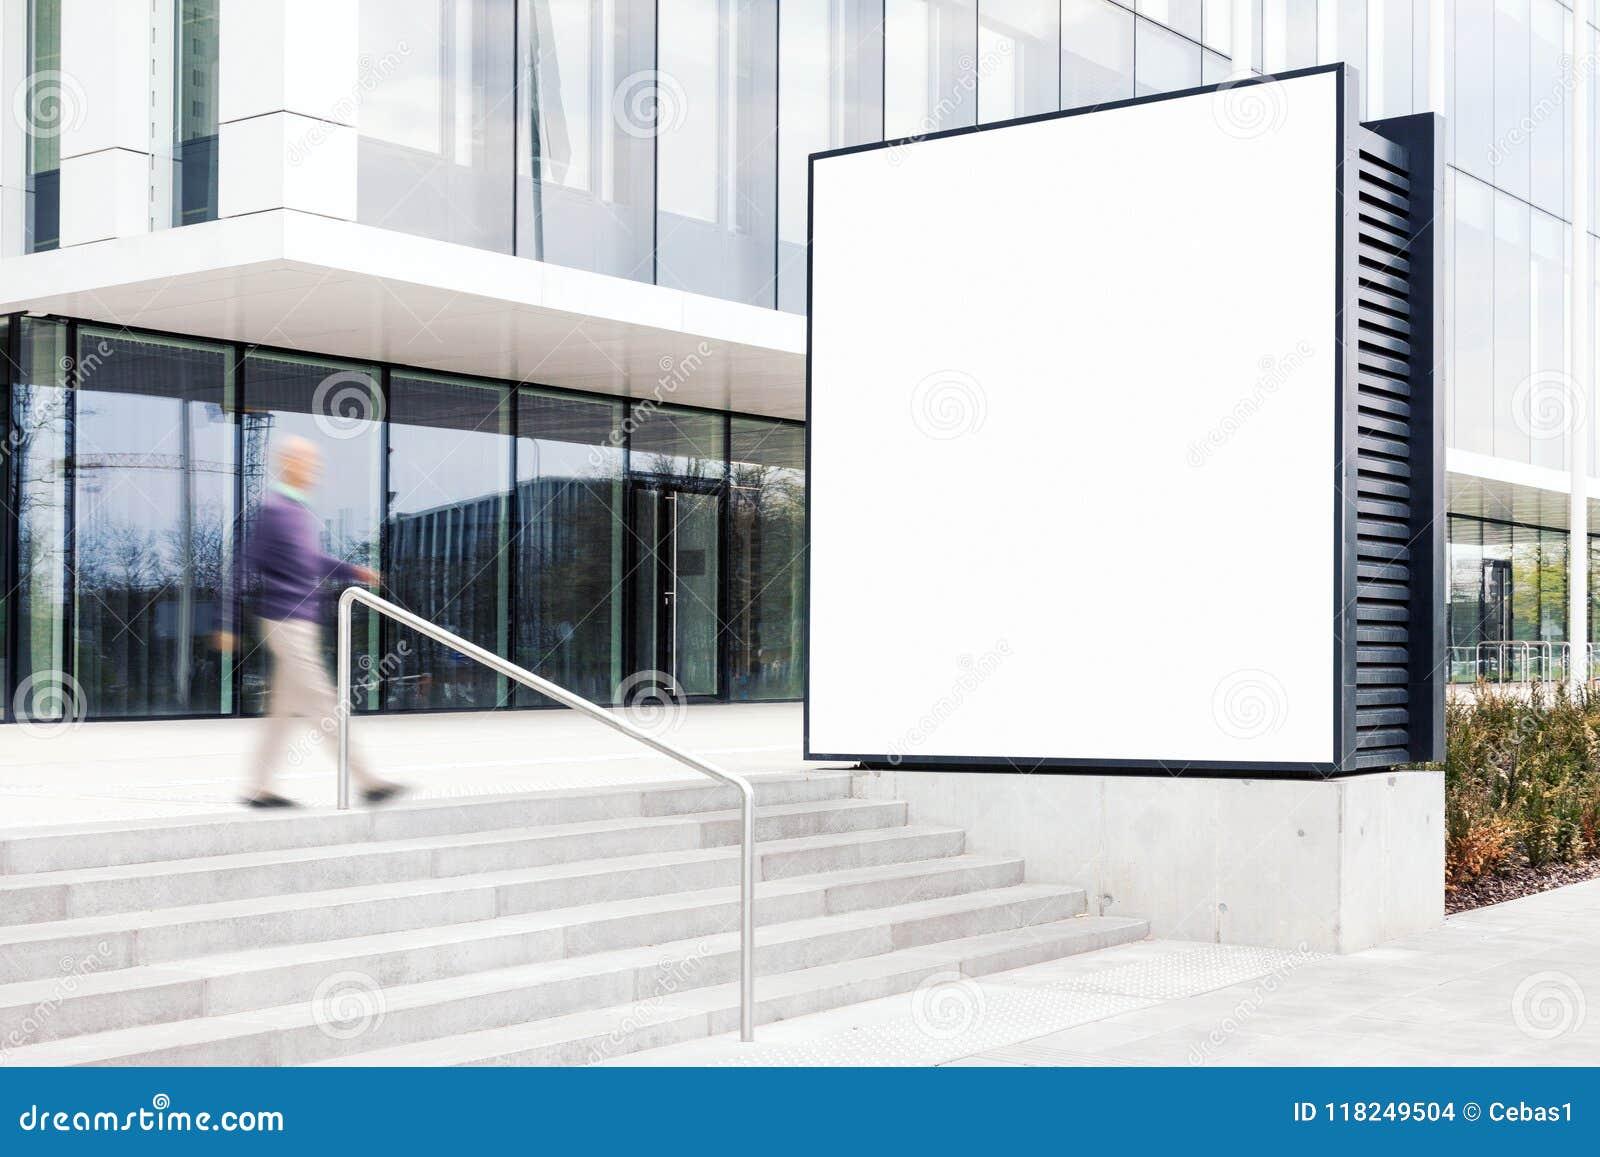 Modelo exterior do quadro de avisos no distrito financeiro moderno